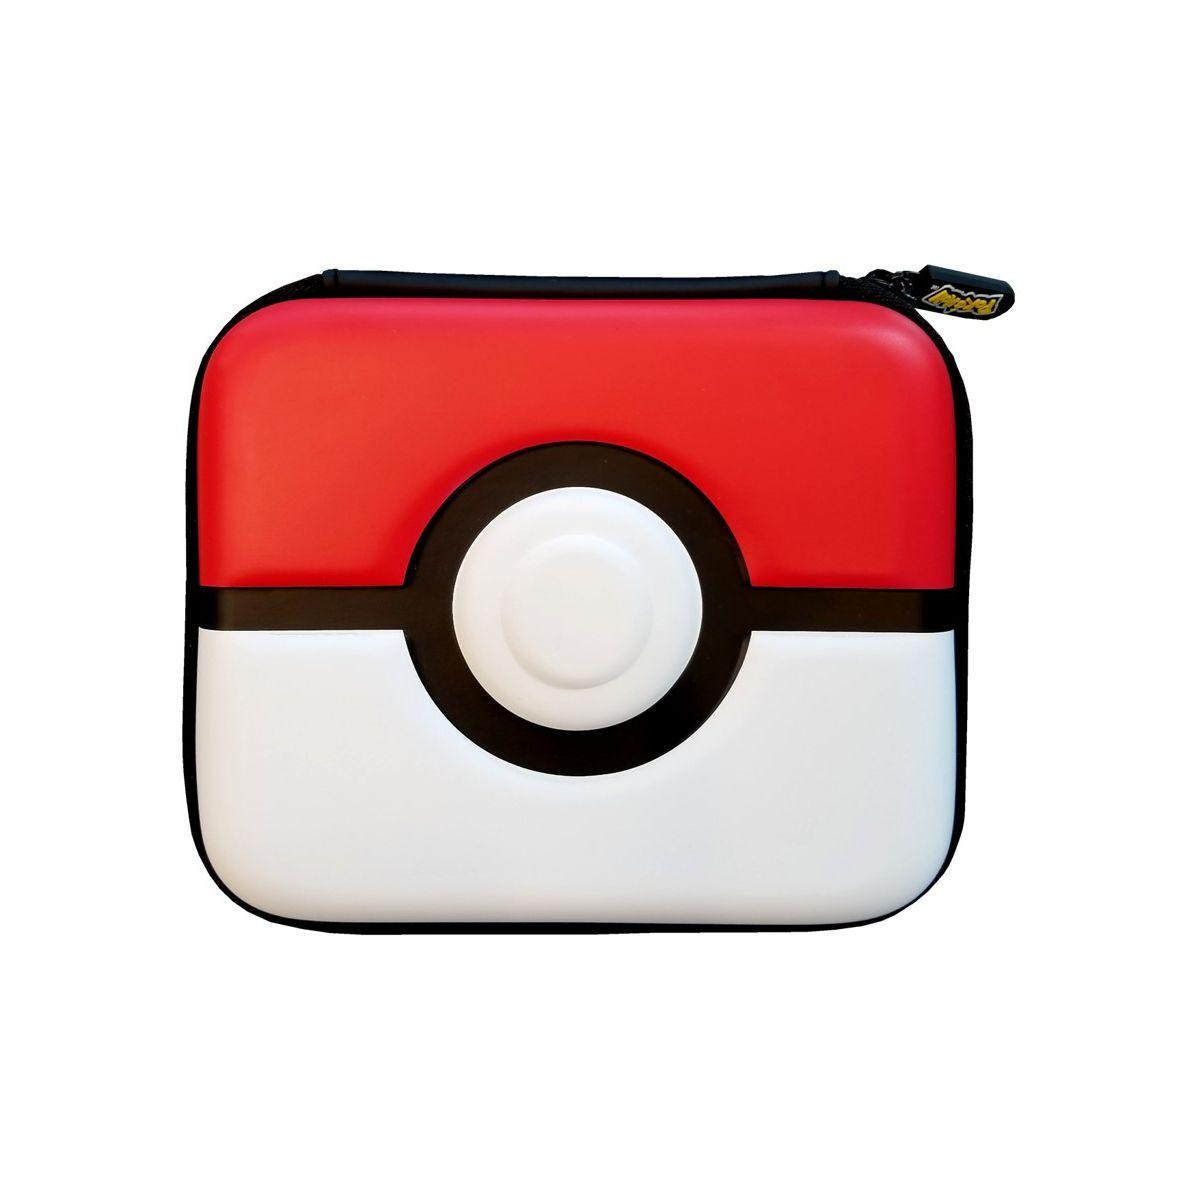 Housse de protection pdp housse pokemon pokeball 2ds (photo)